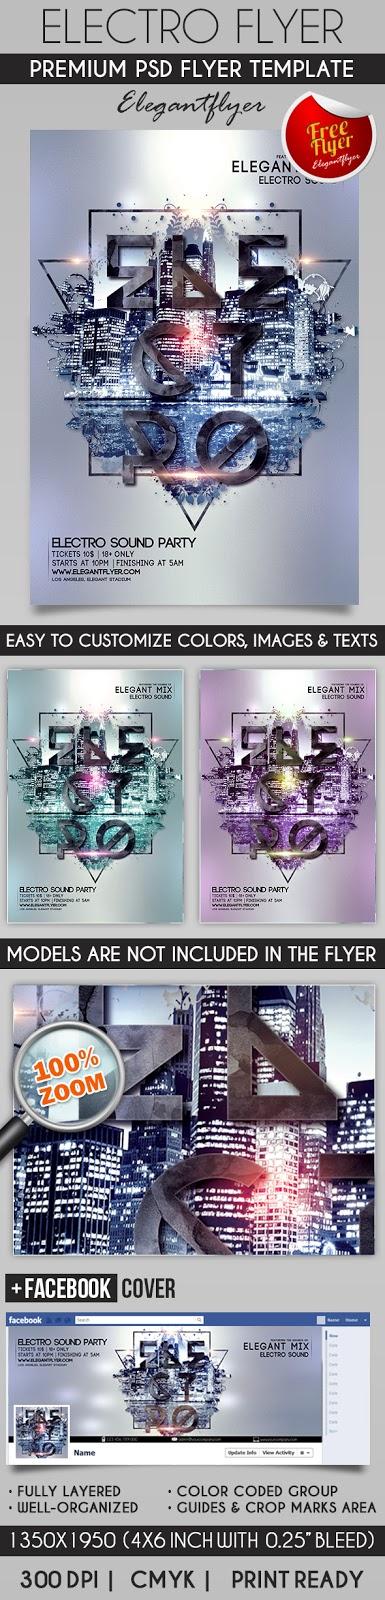 Electro Flyer 2016 \u2013 Flyer PSD Template + Facebook Cover  Download - electro flyer